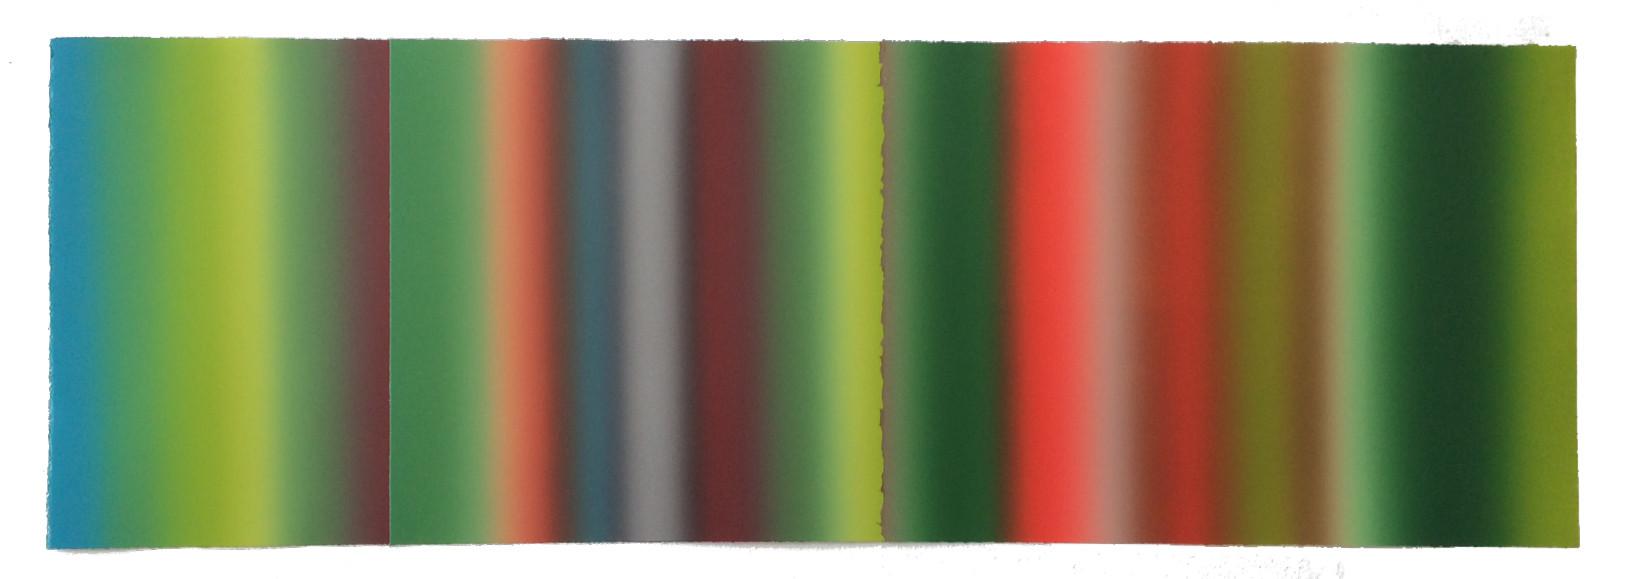 """La Vida""  2014 Monotype Collage 14""x44"""